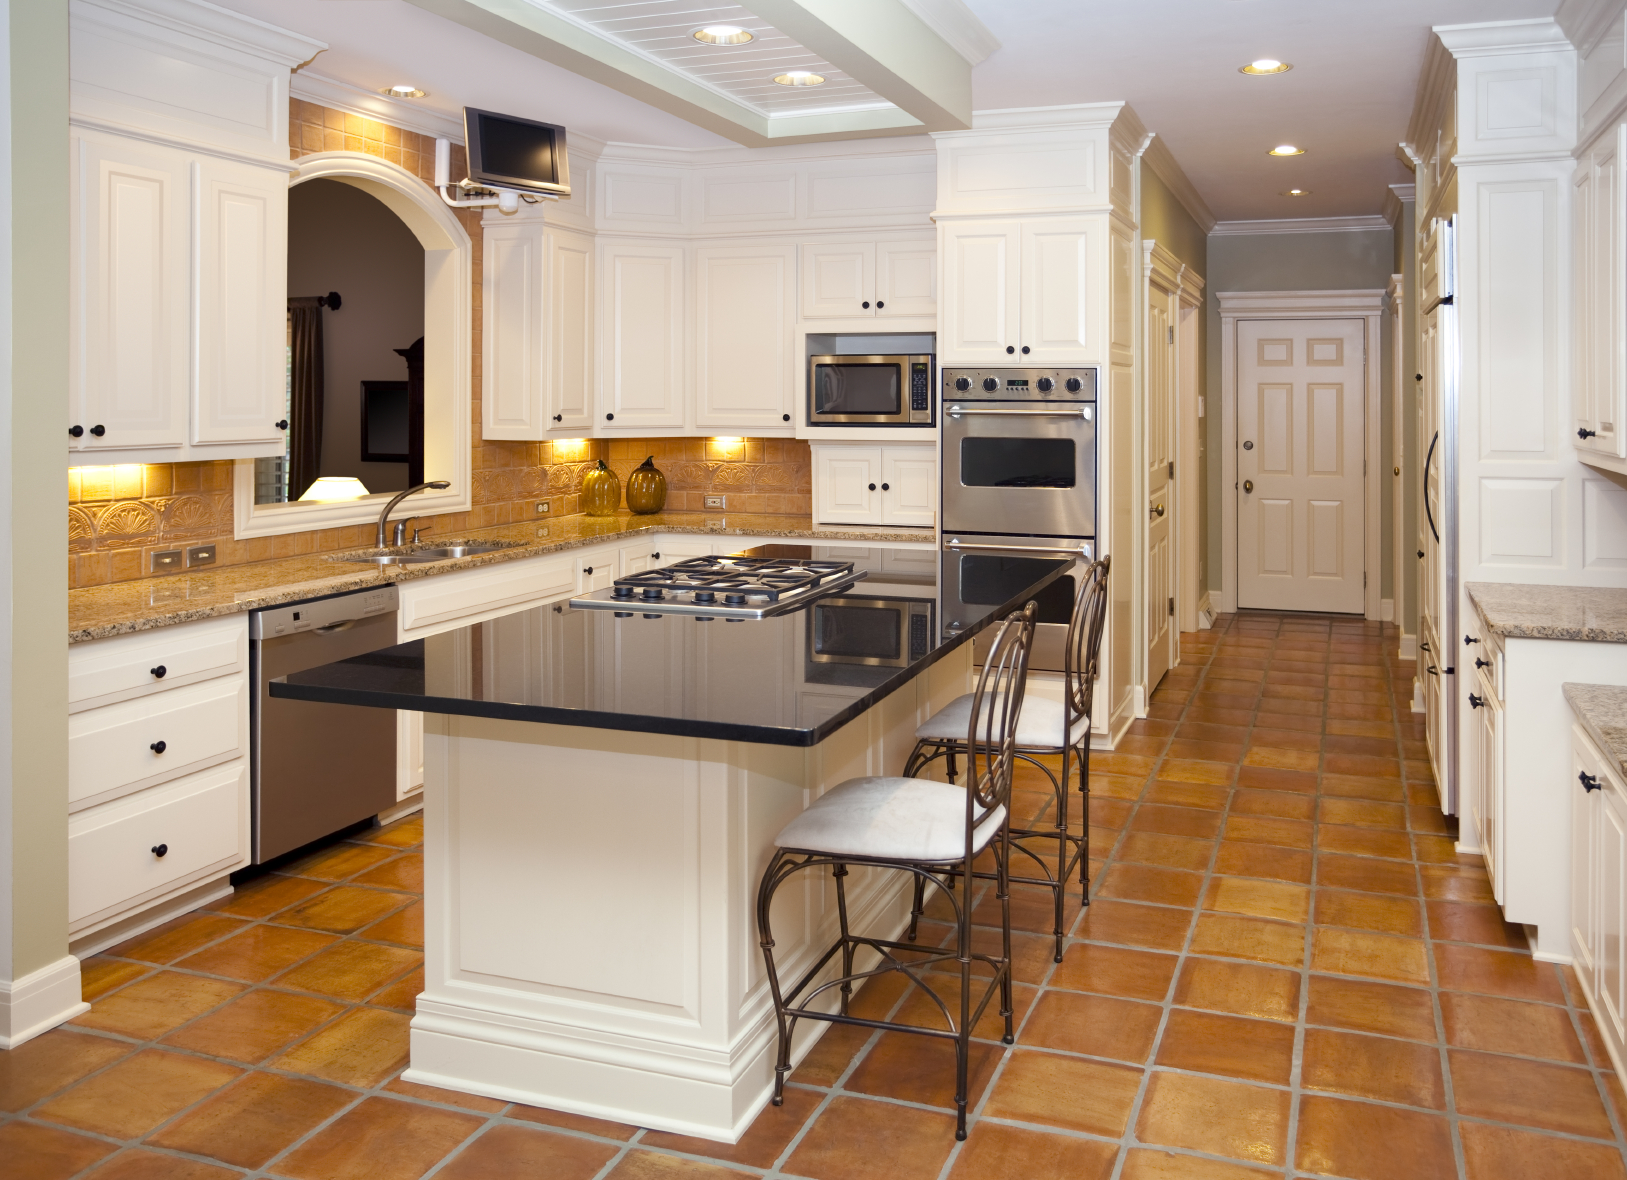 Home Decor wood floor kitchen